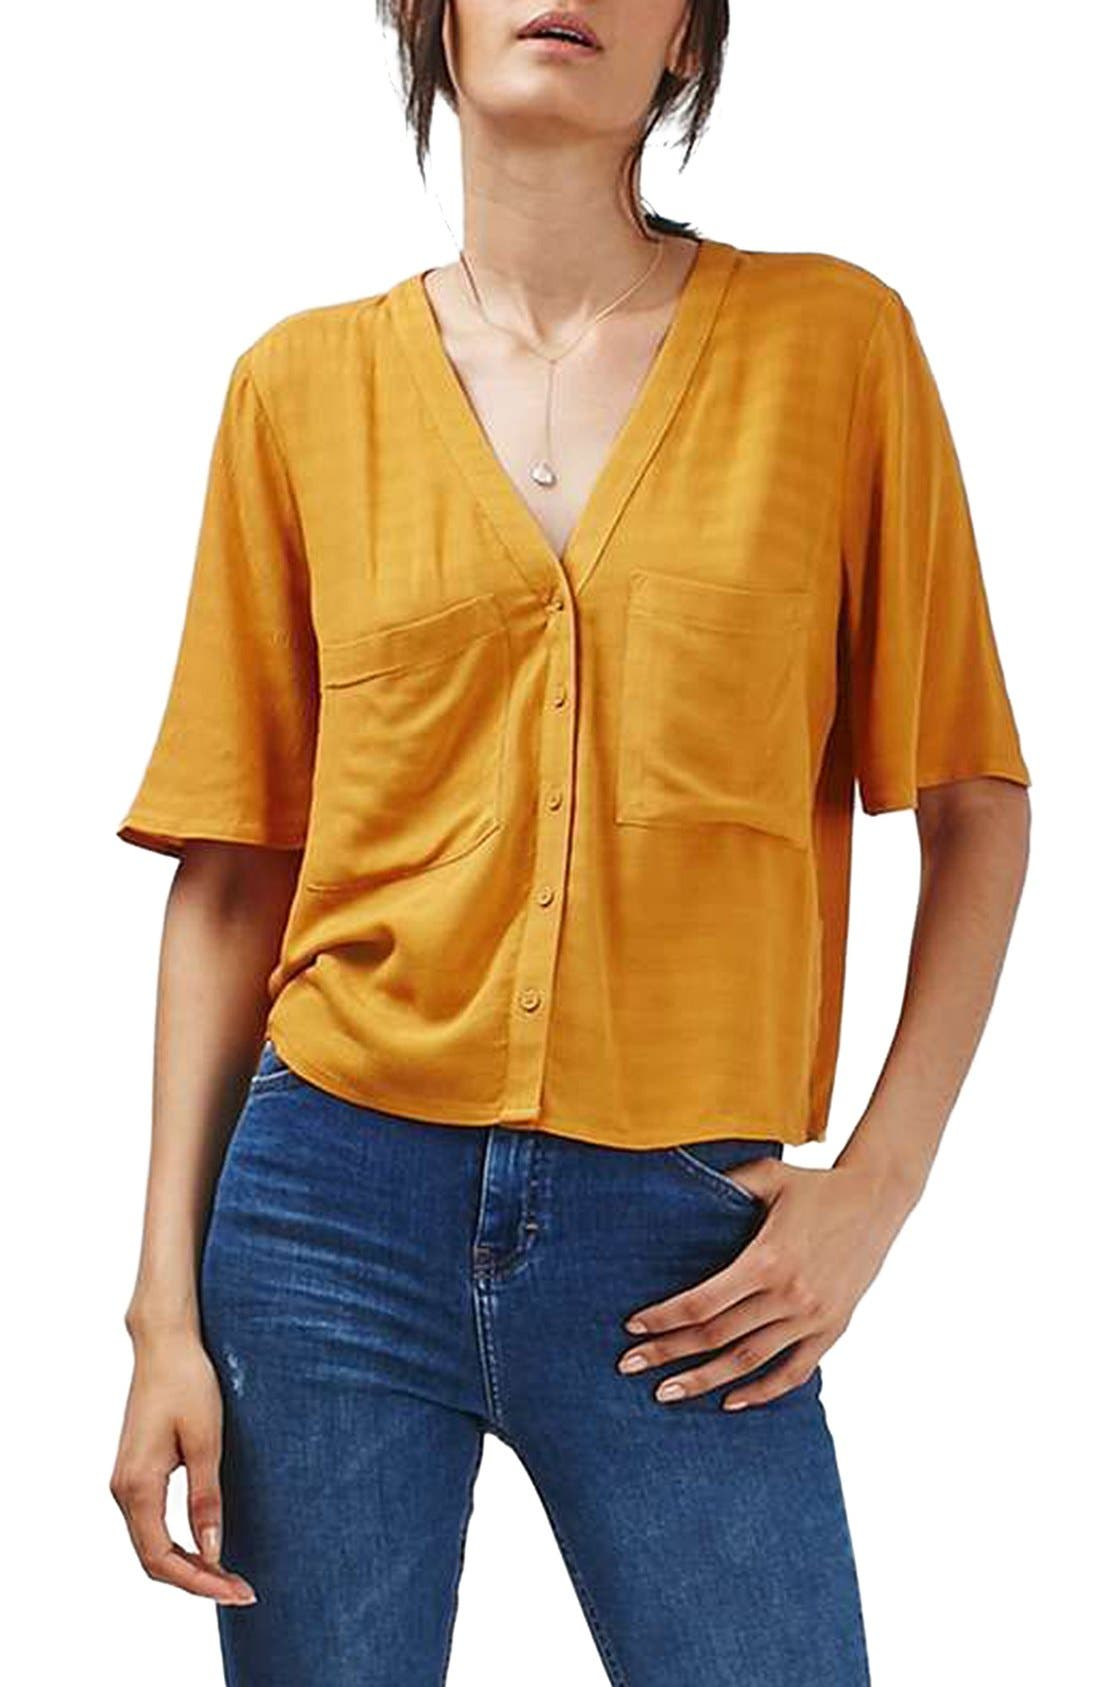 Main Image - Topshop 'Holly' Short Sleeve V-Neck Shirt